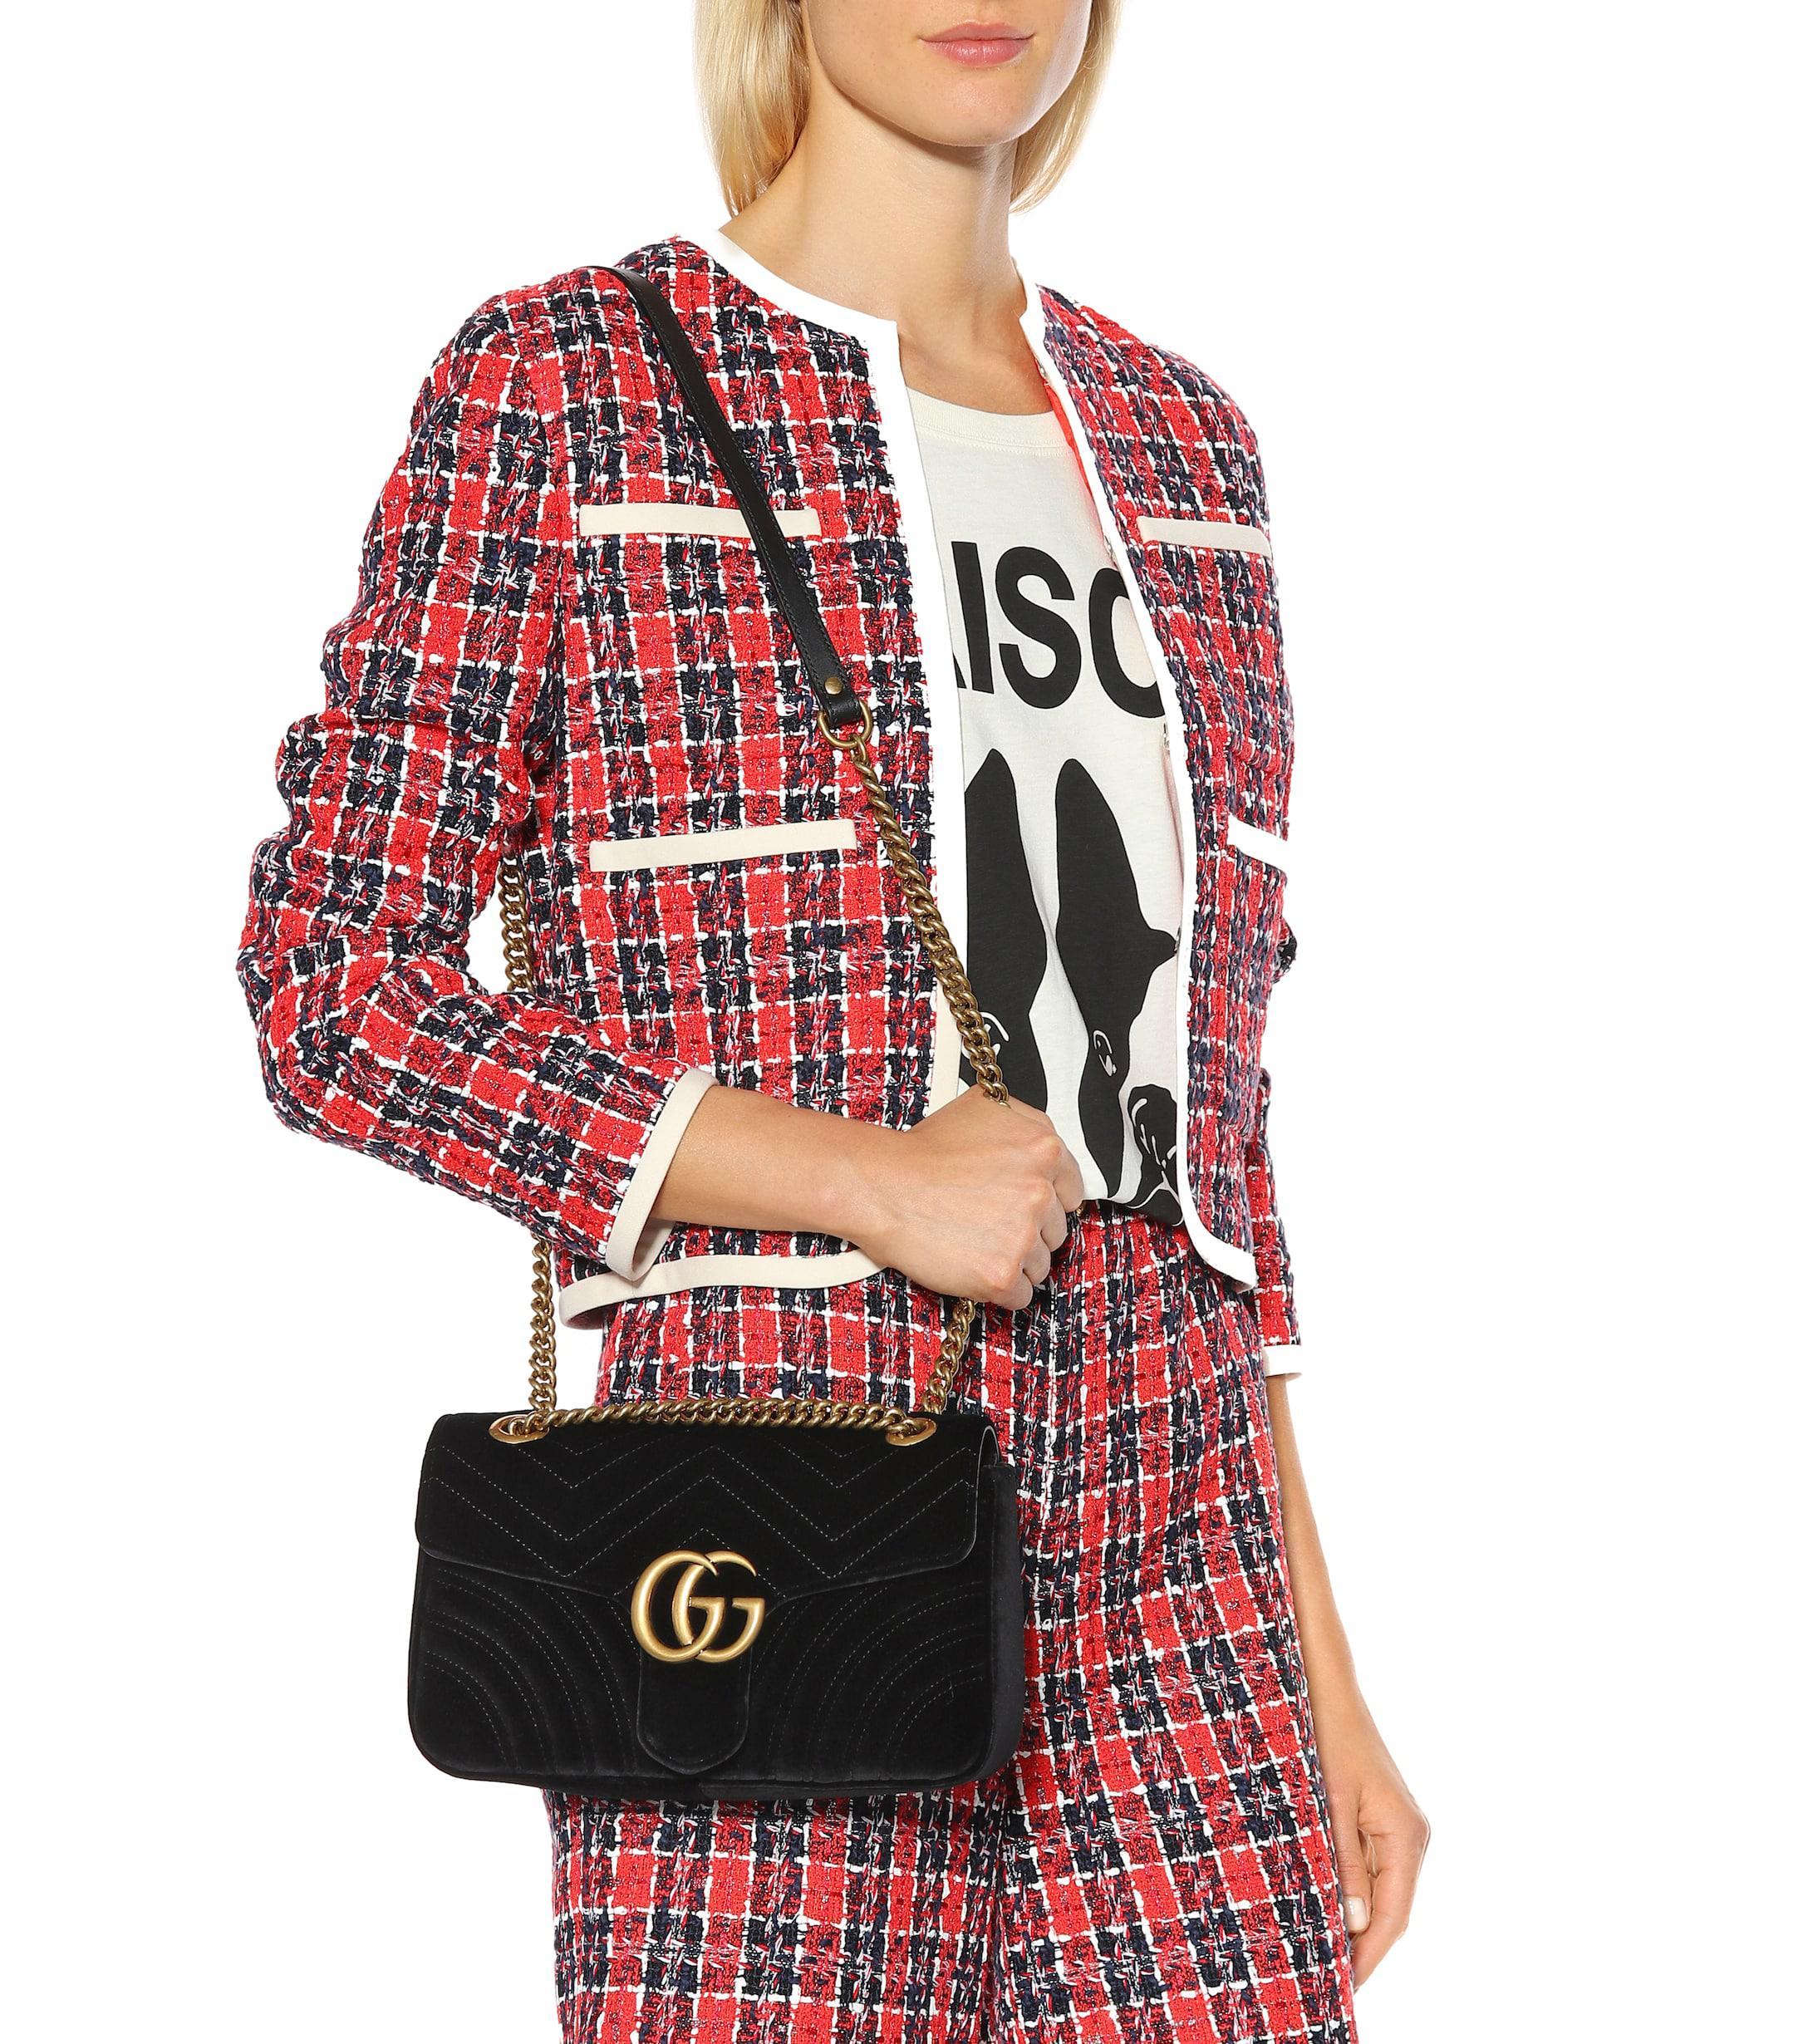 eea25f50a89edd ... GG Marmont Small Velvet Shoulder Bag - Lyst. View fullscreen